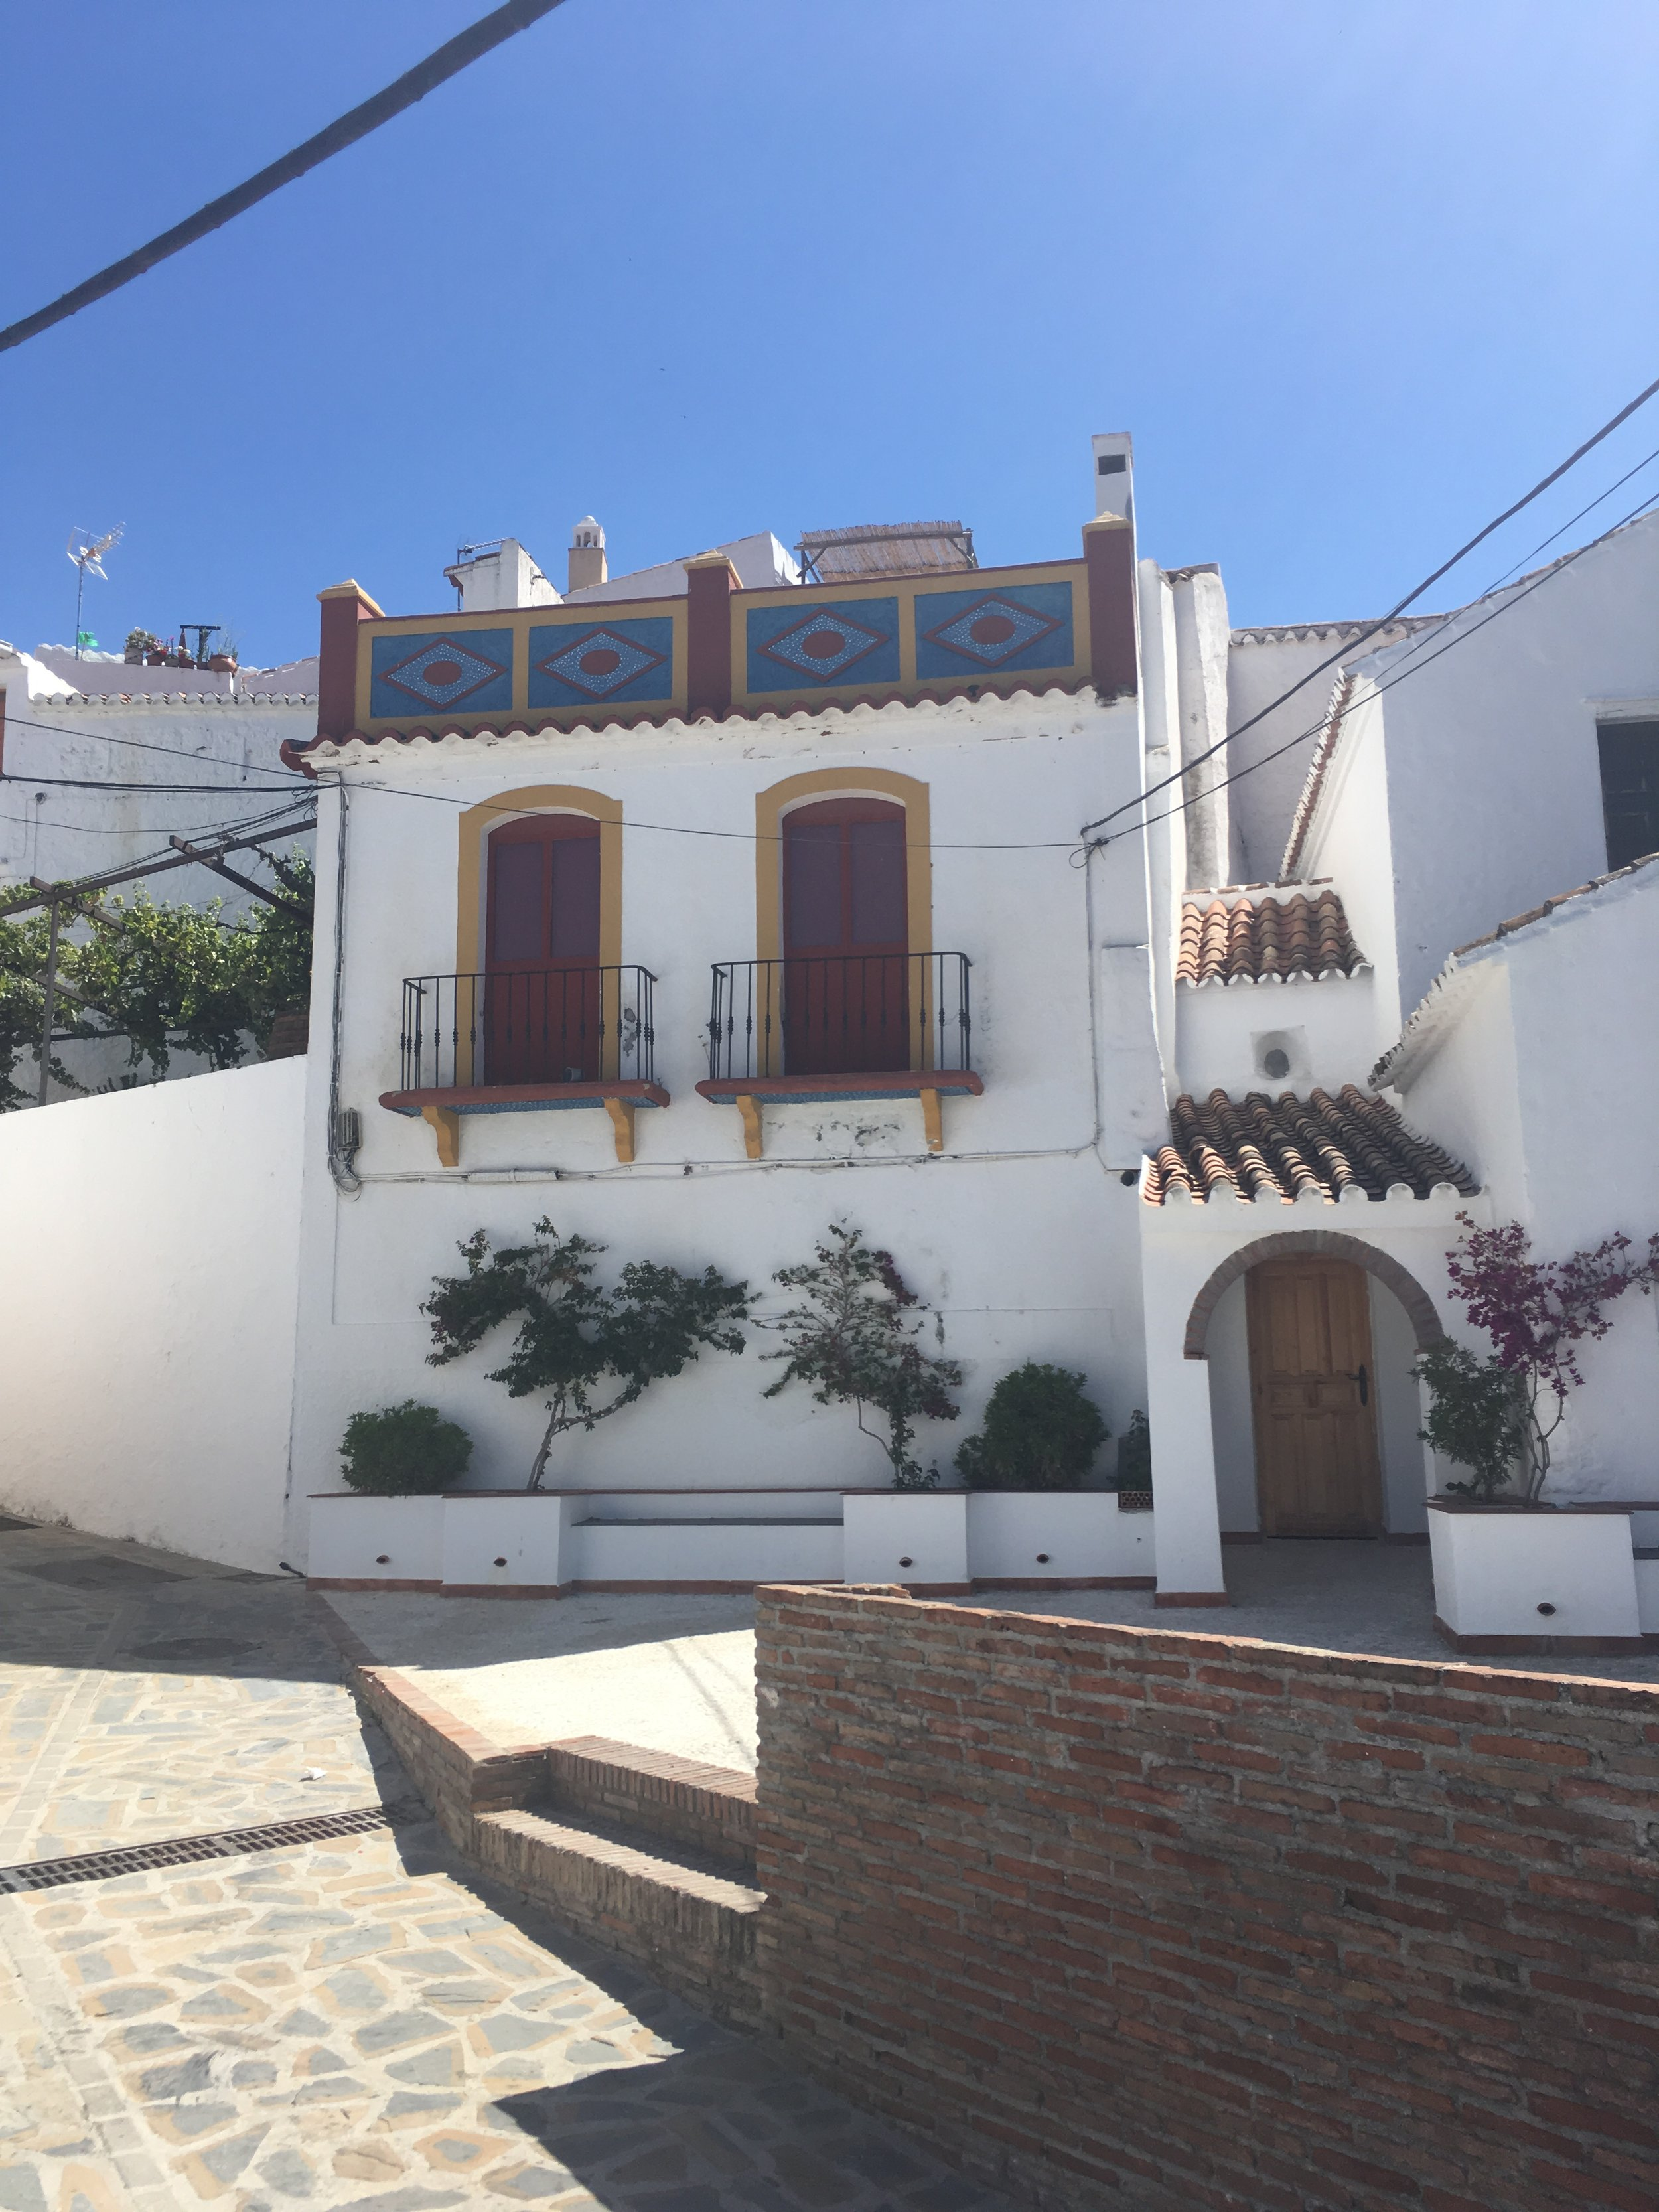 Town of Salares